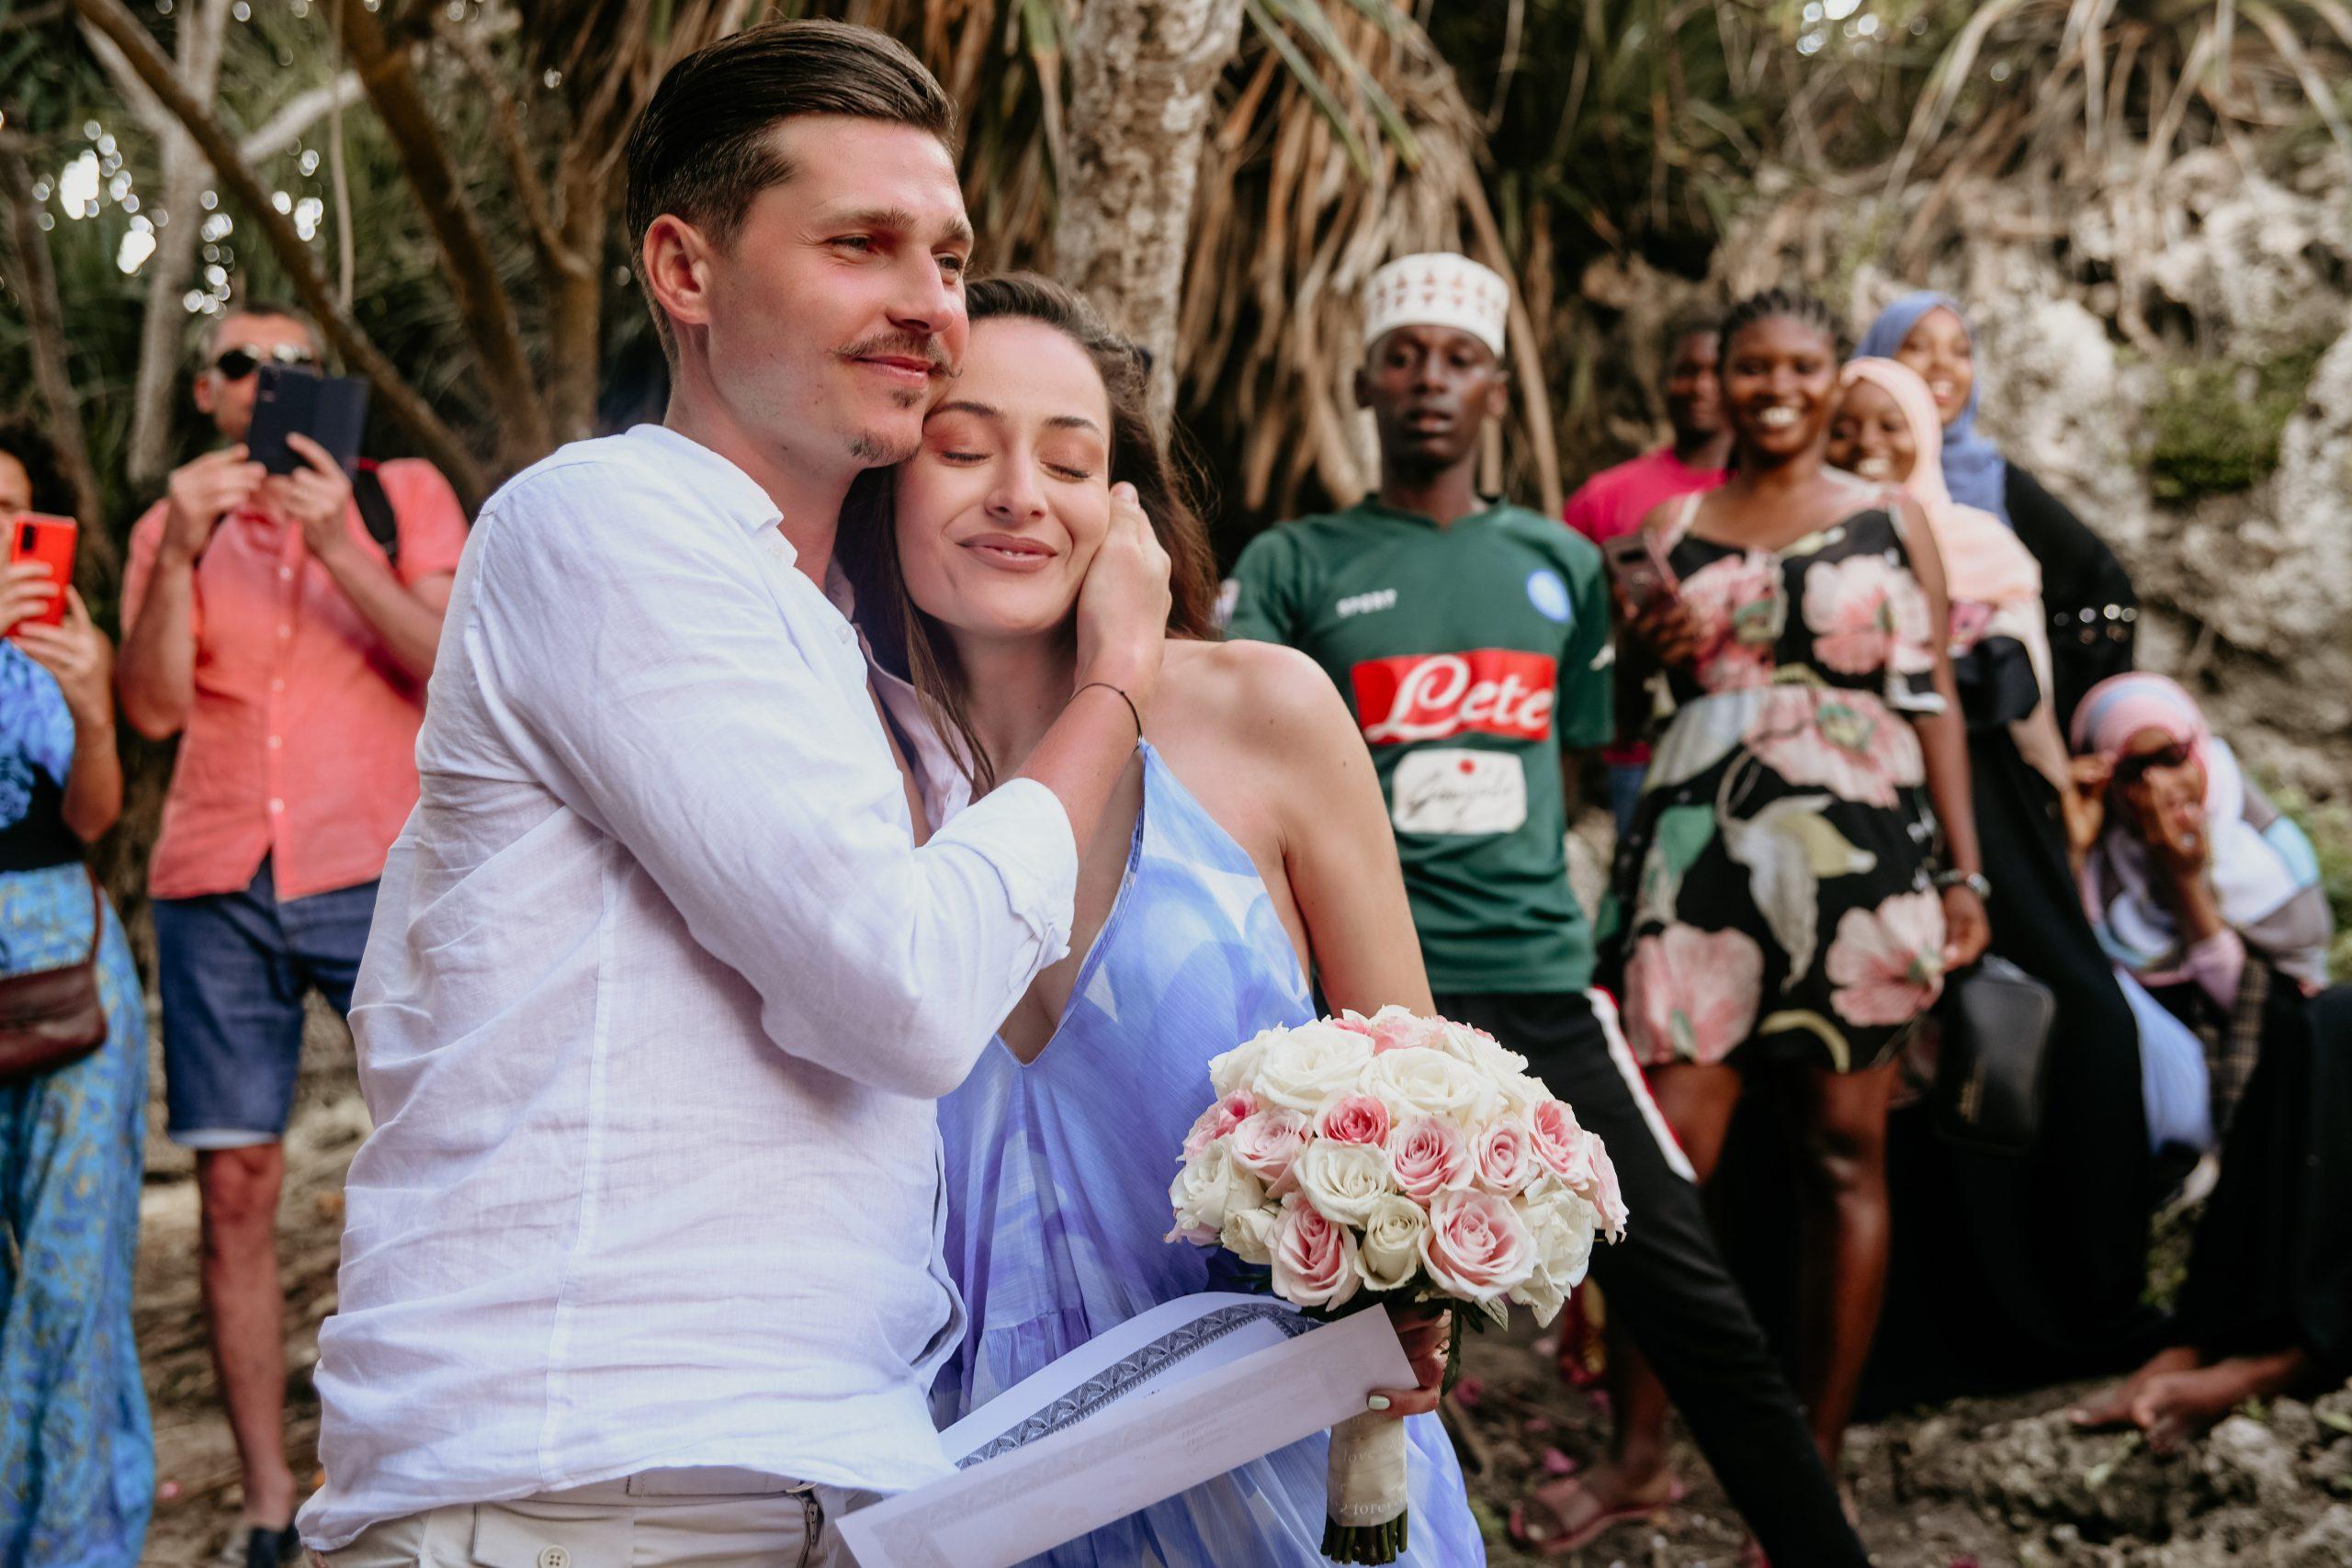 Fotografie de cuplu, Fotografie de nunta in Zanzibar, Sedință foto pe plajă in Zanzibar, Fotografie Travel,